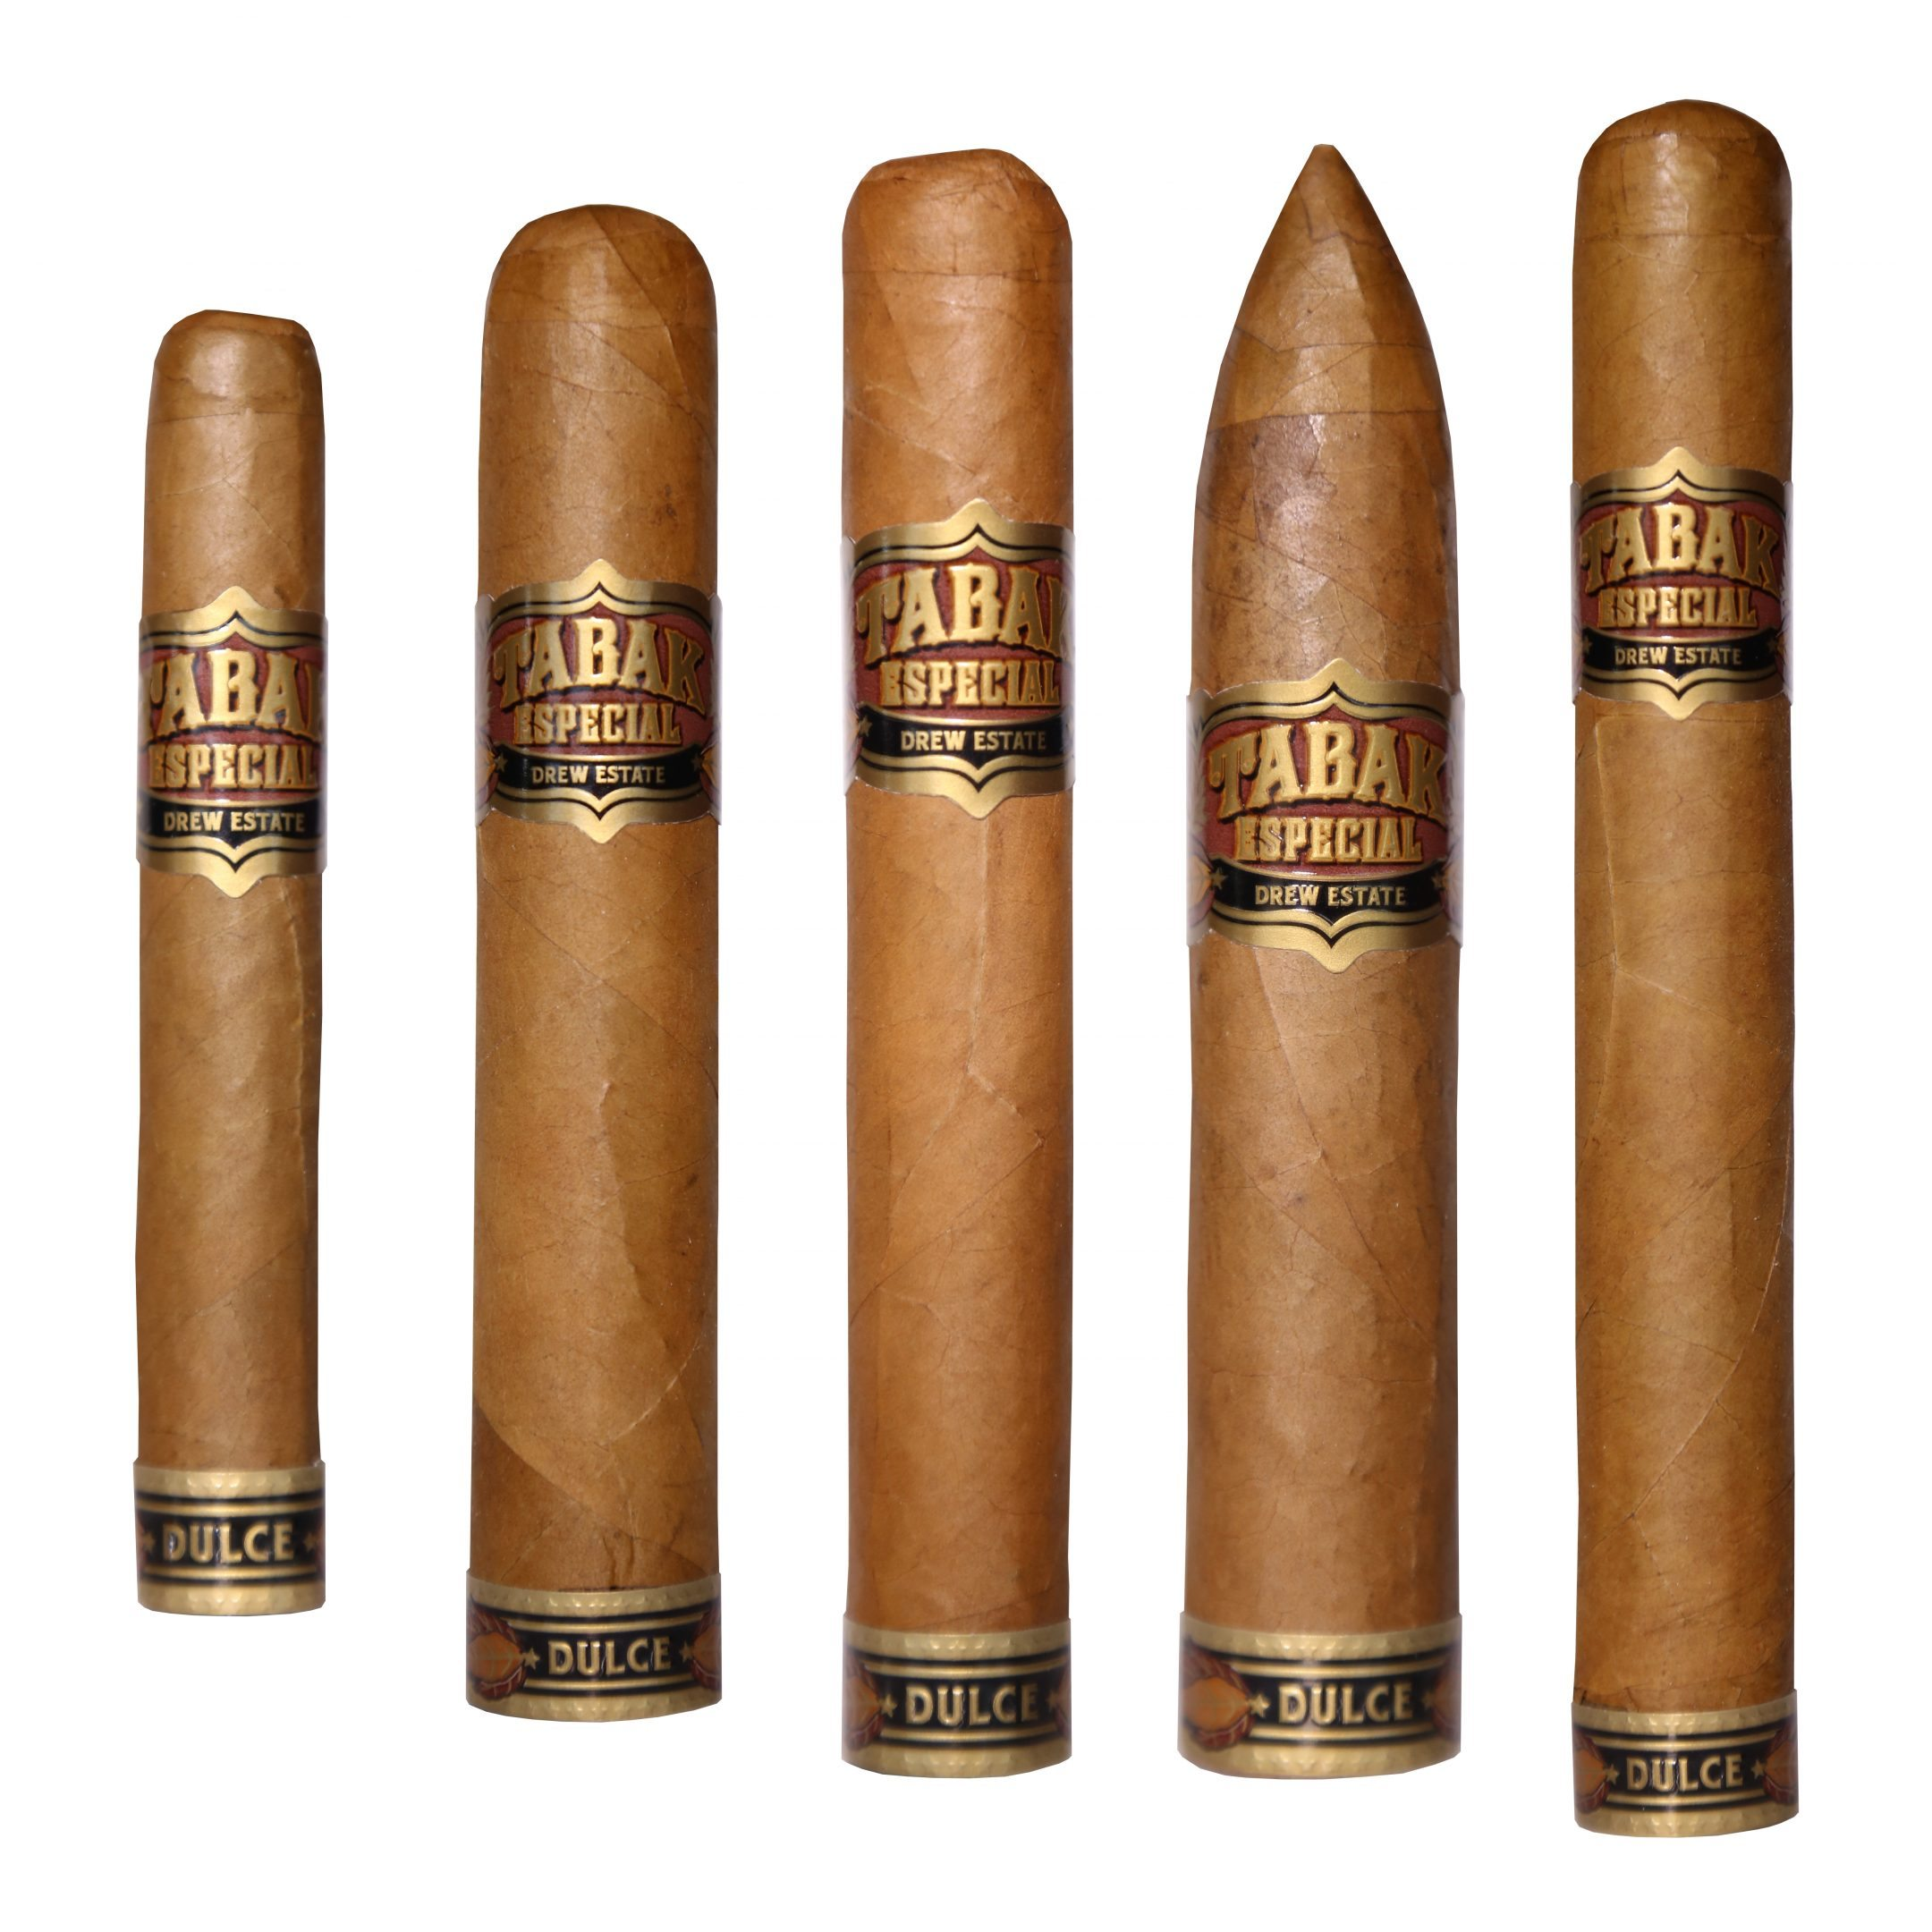 Cigar News: Drew Estate Updates Tabak Especial Packaging